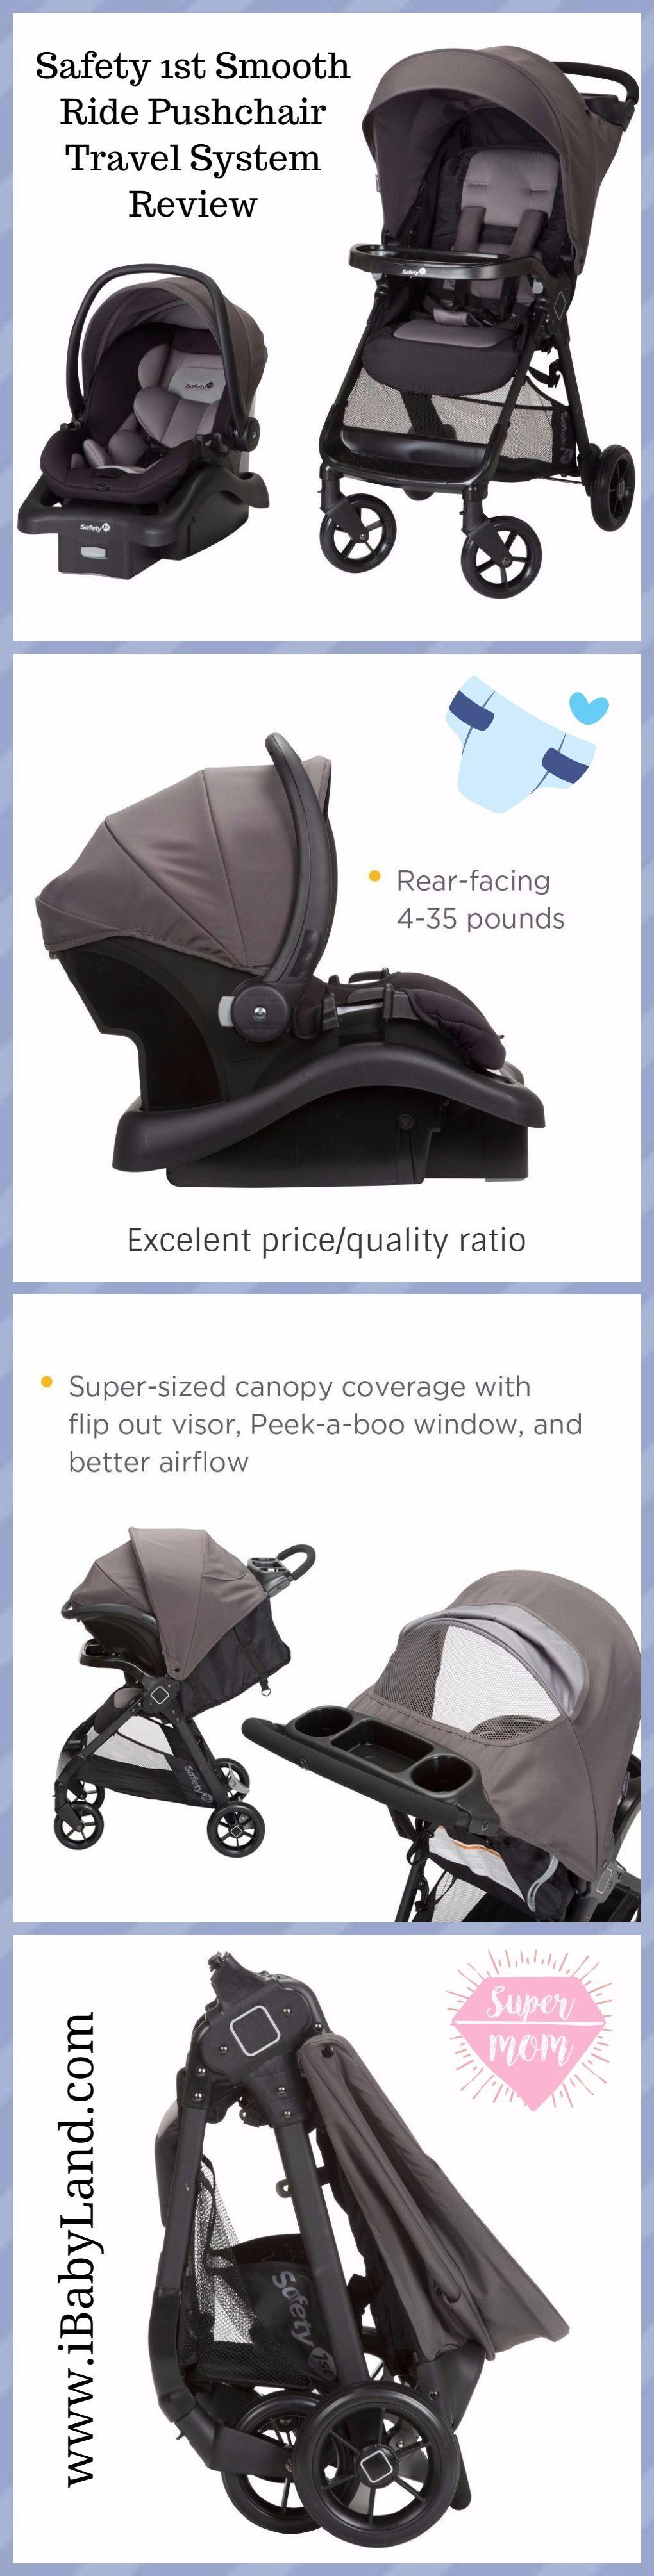 Best baby stroller carseat review We definitely believe